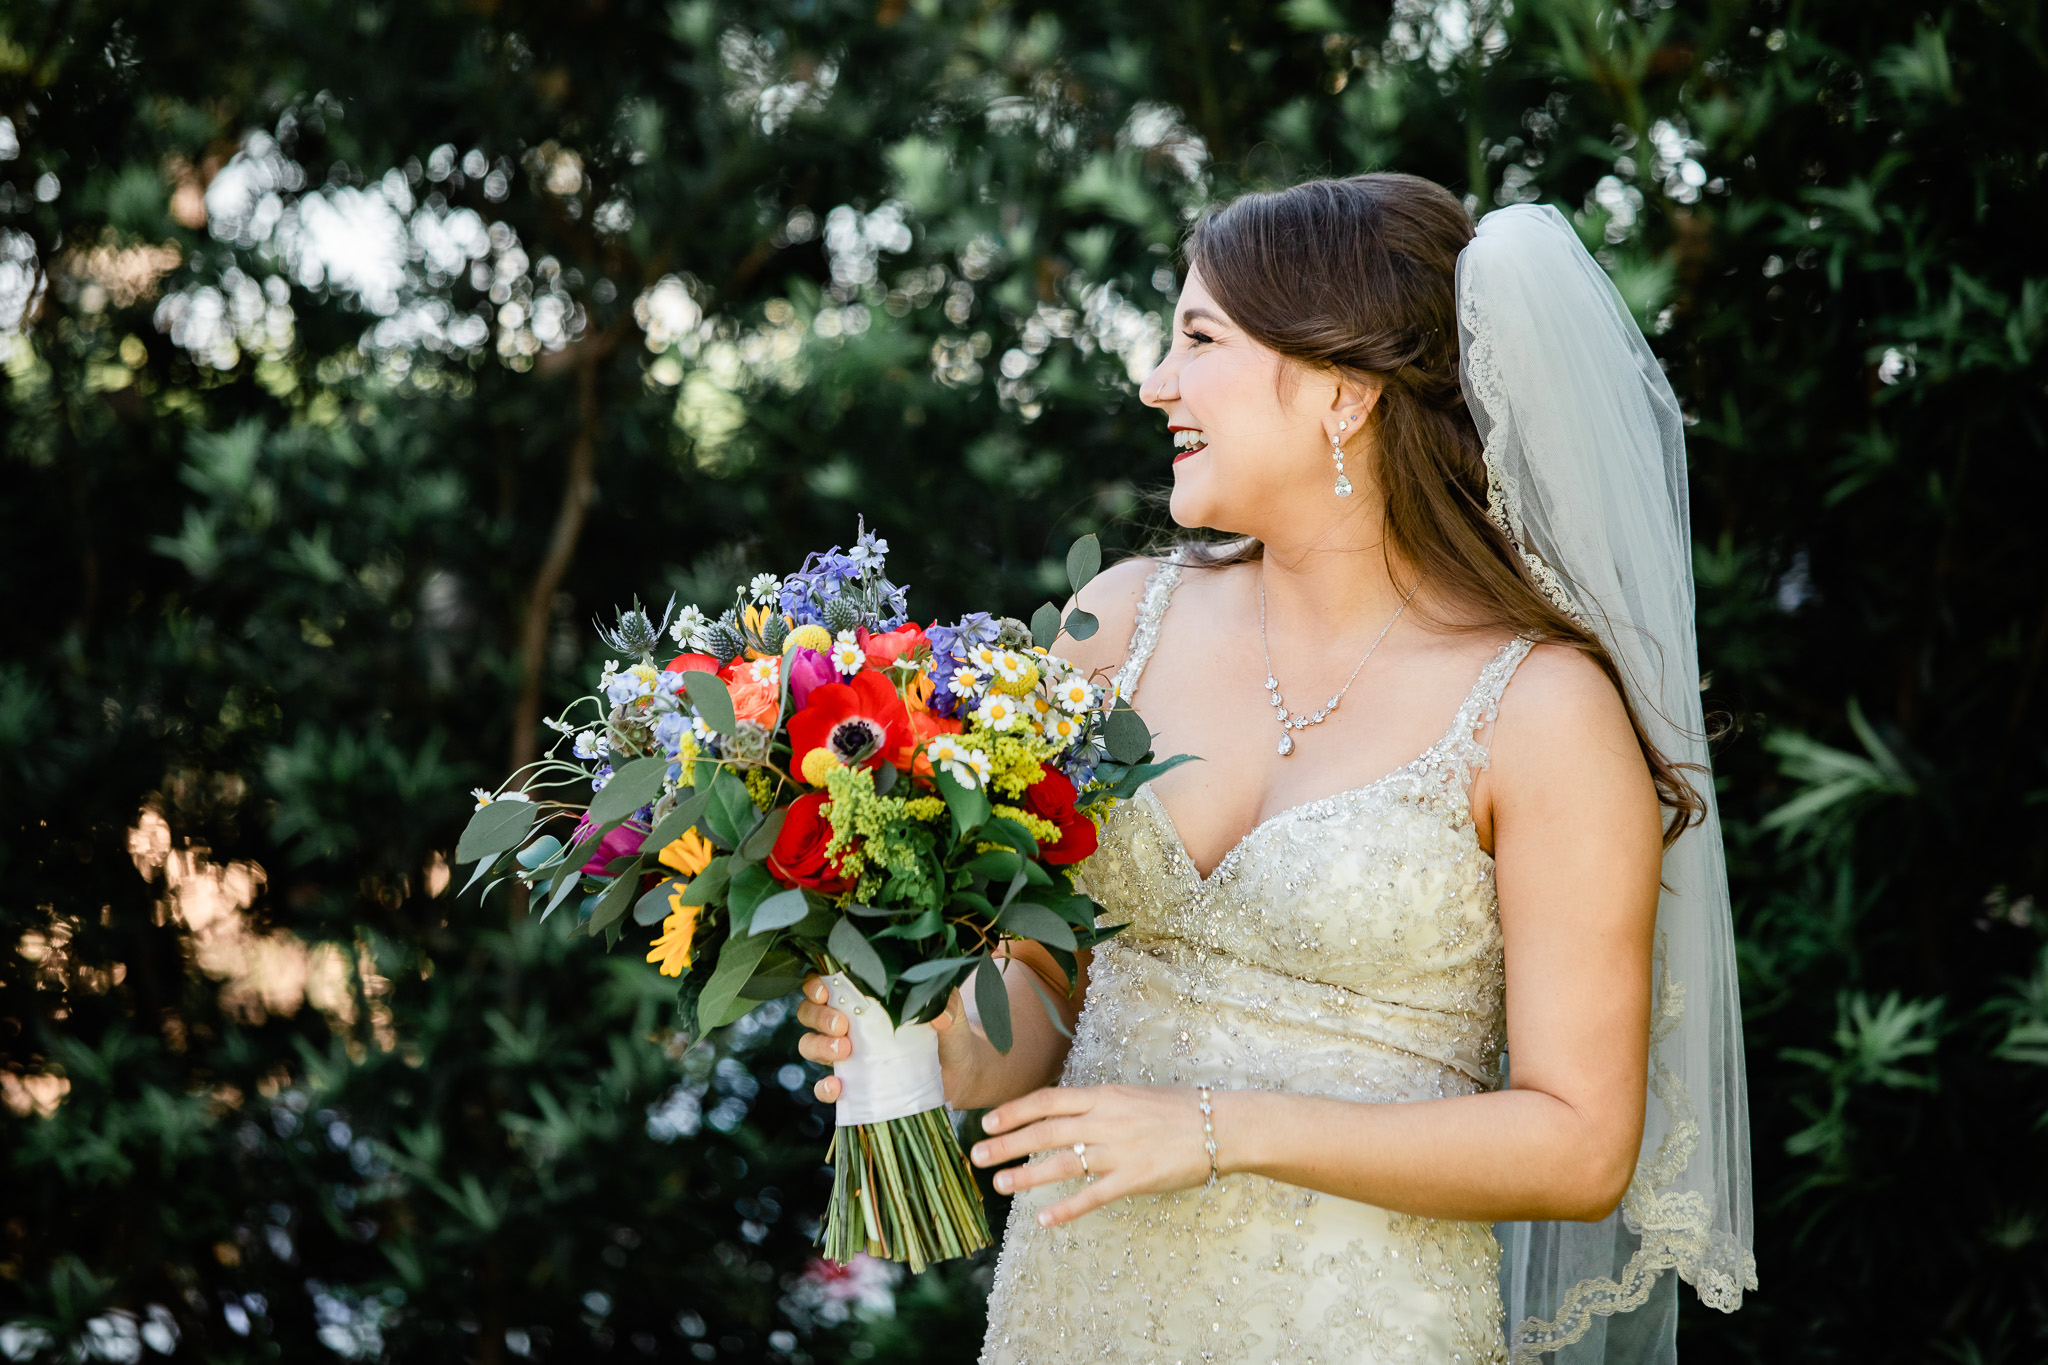 TAMPA_WEDDING_PHOTOGRAPHER_MPMZ_TJL46979_0043.jpg